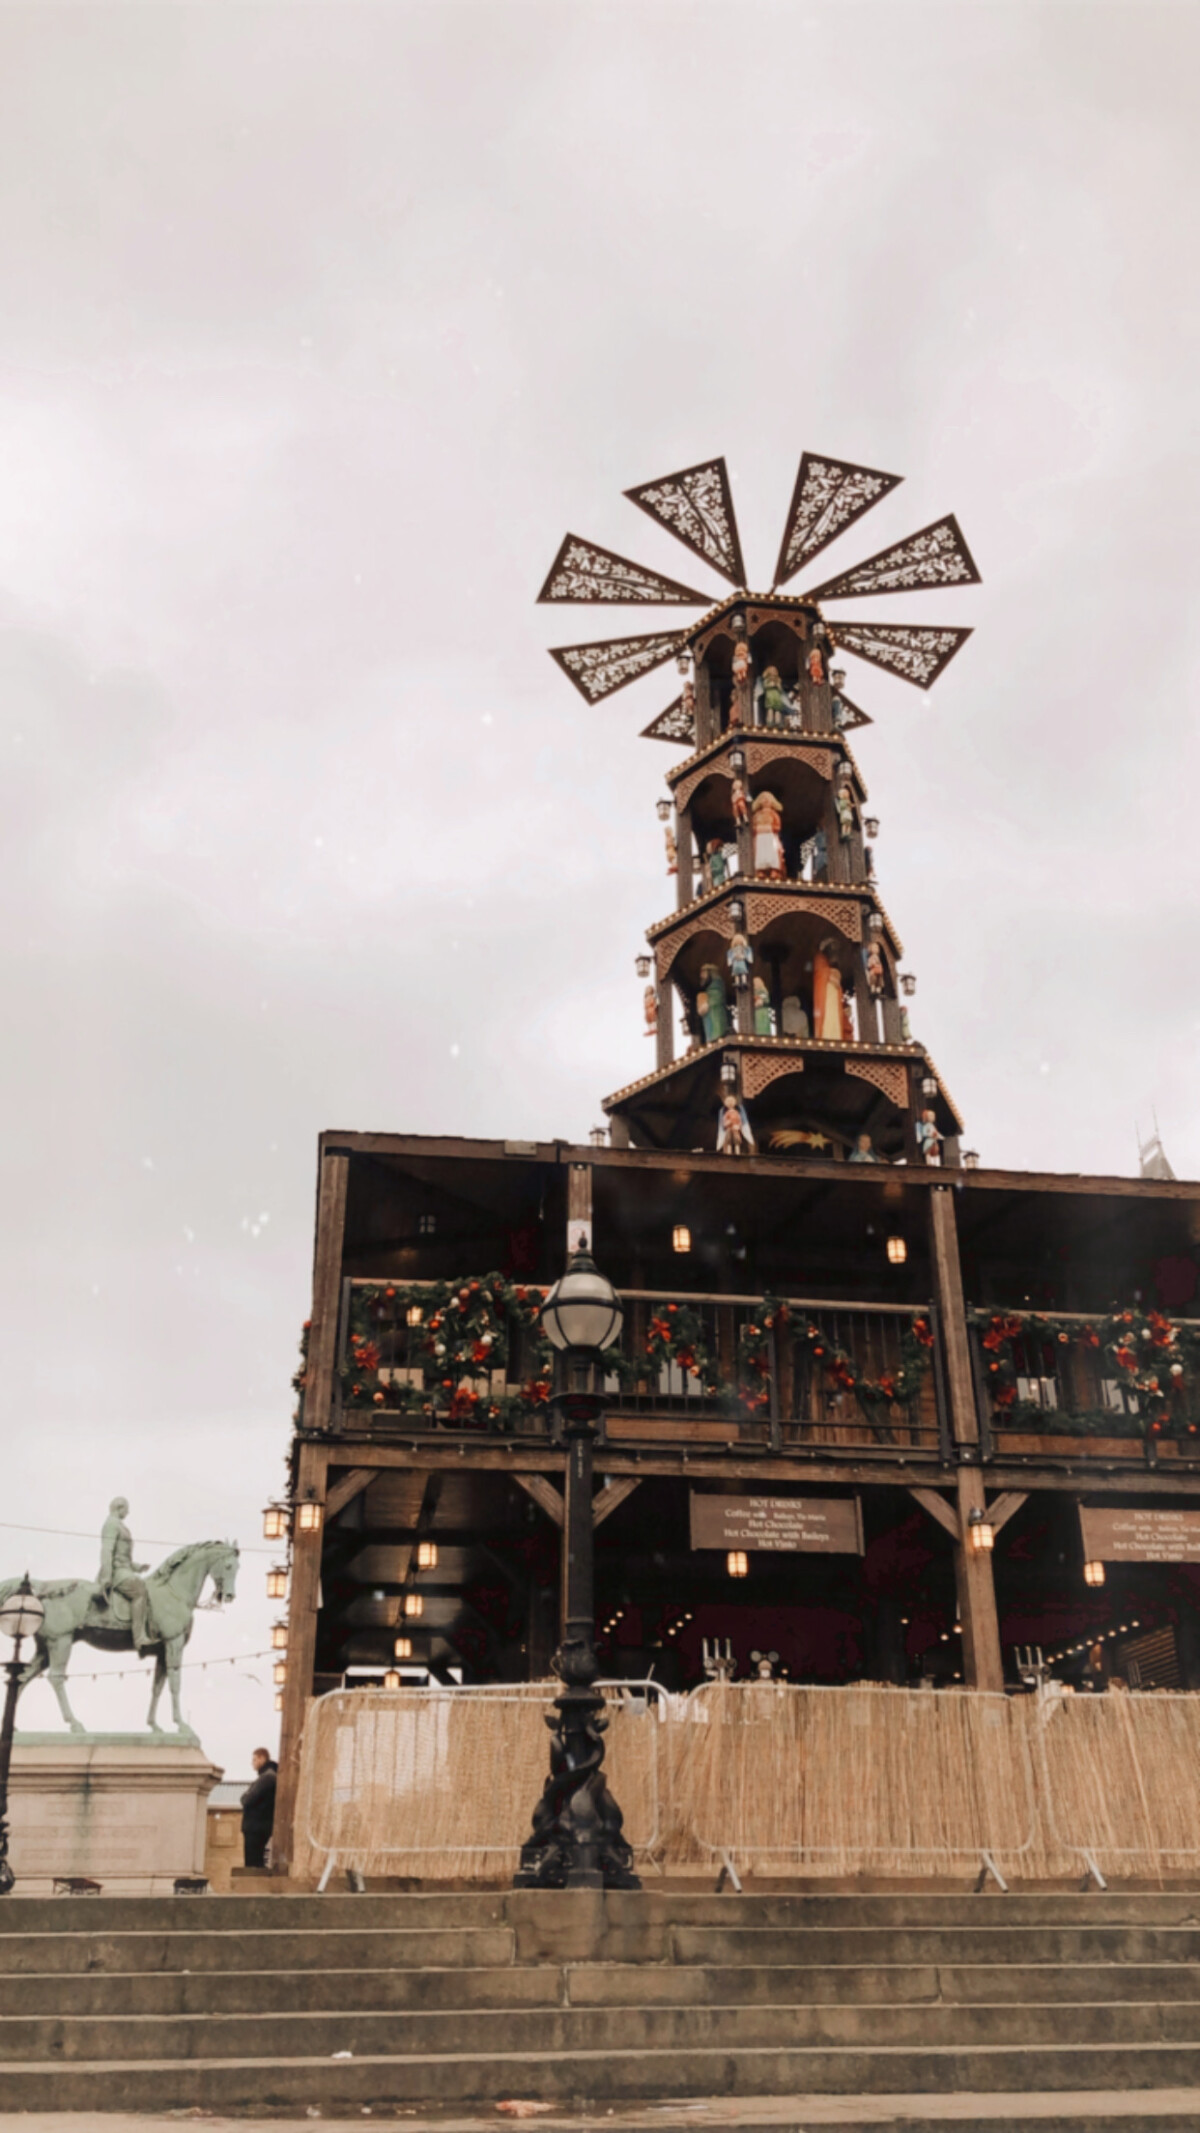 Liverpool christmas market - windmill bar